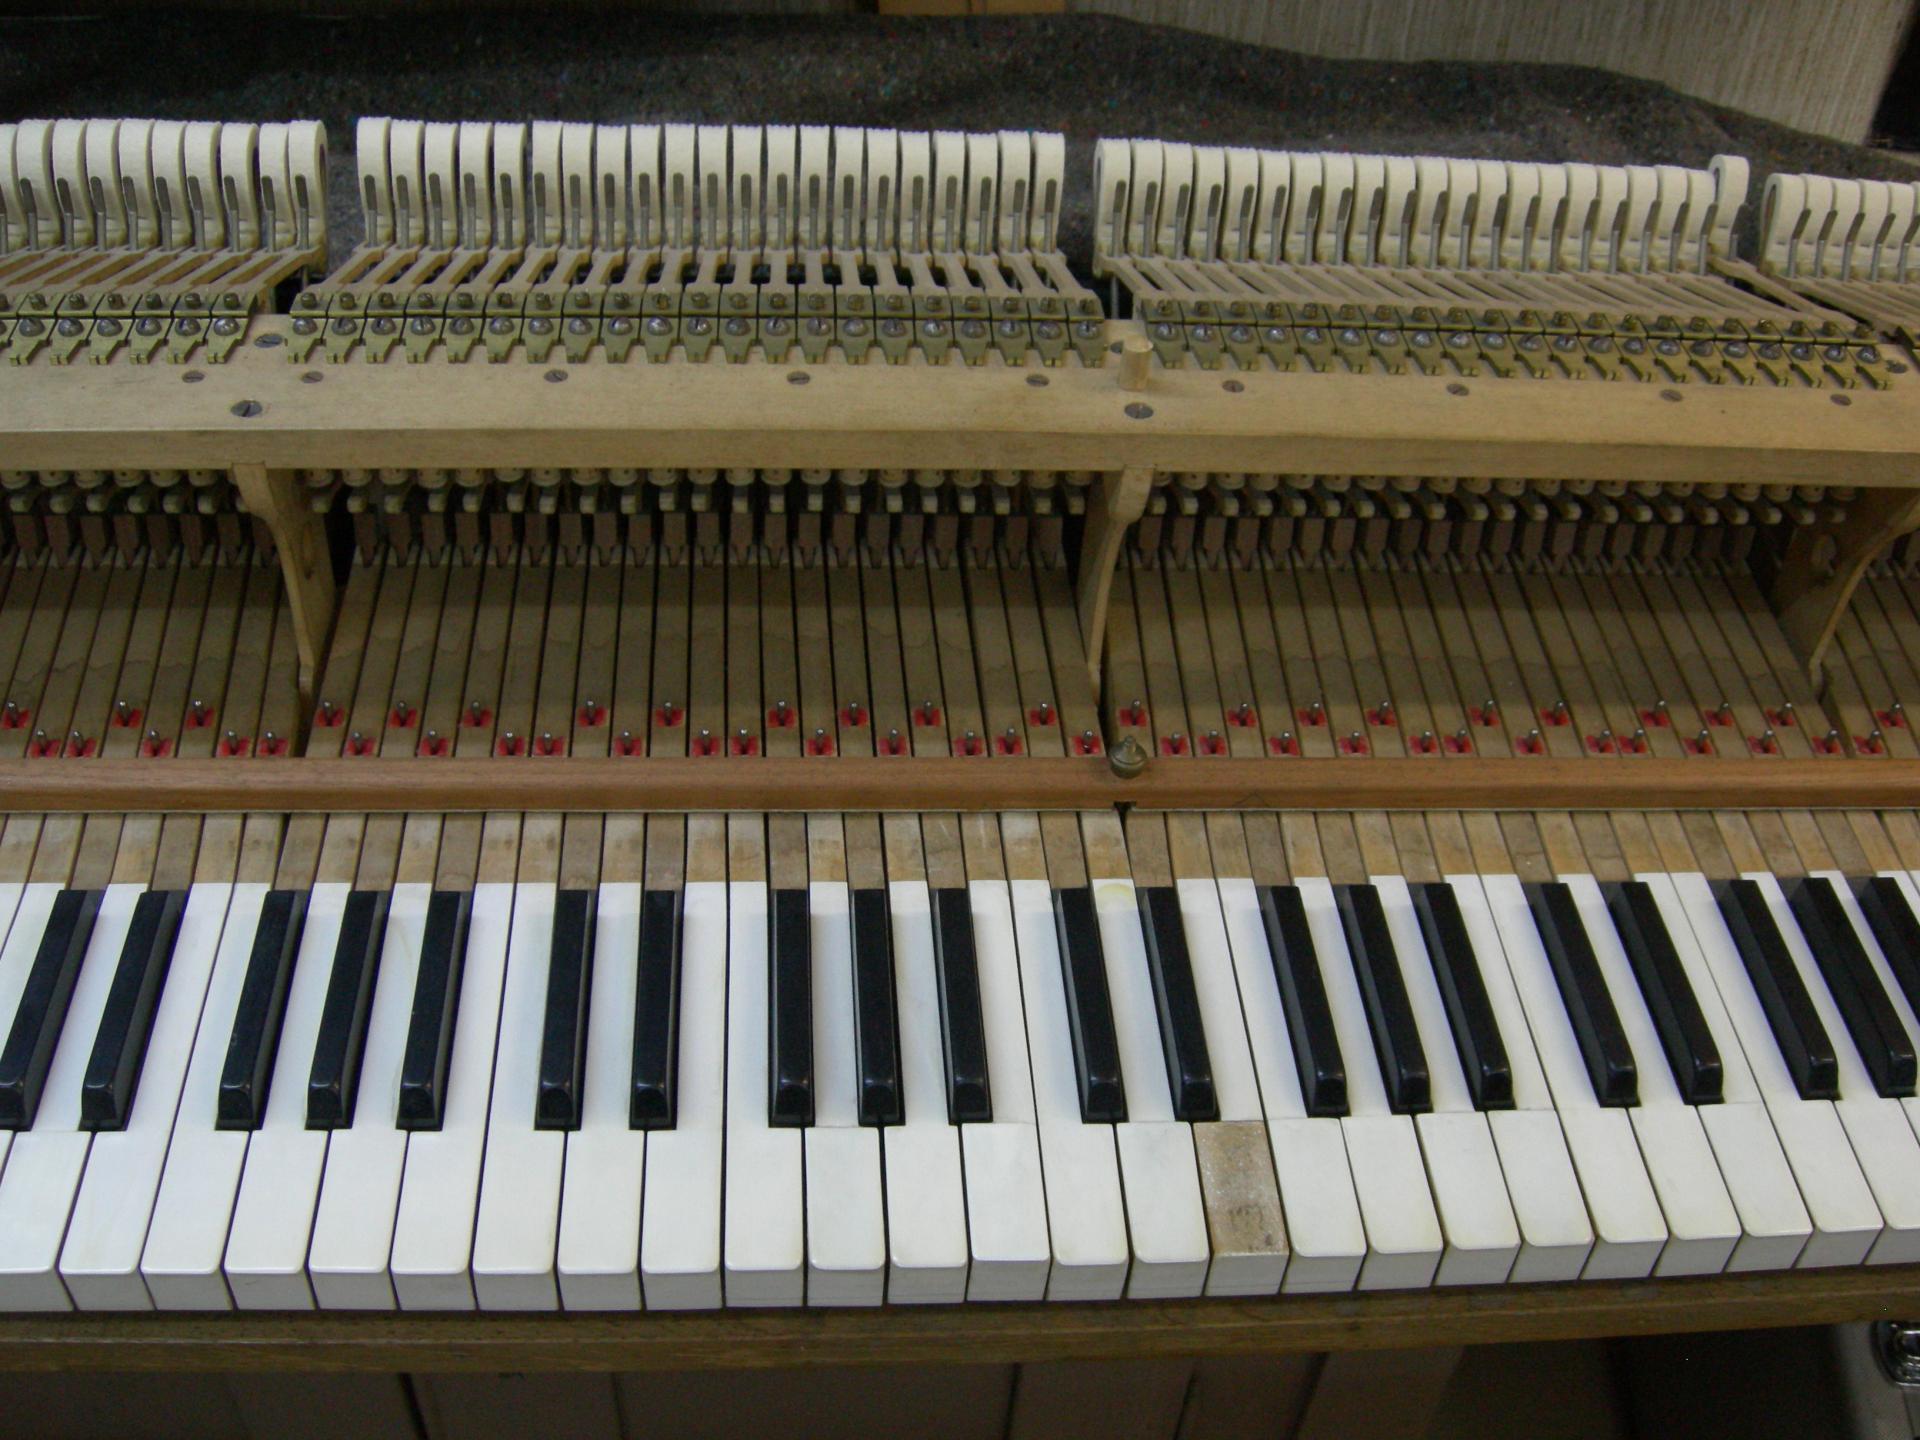 Erardbo clavier avant